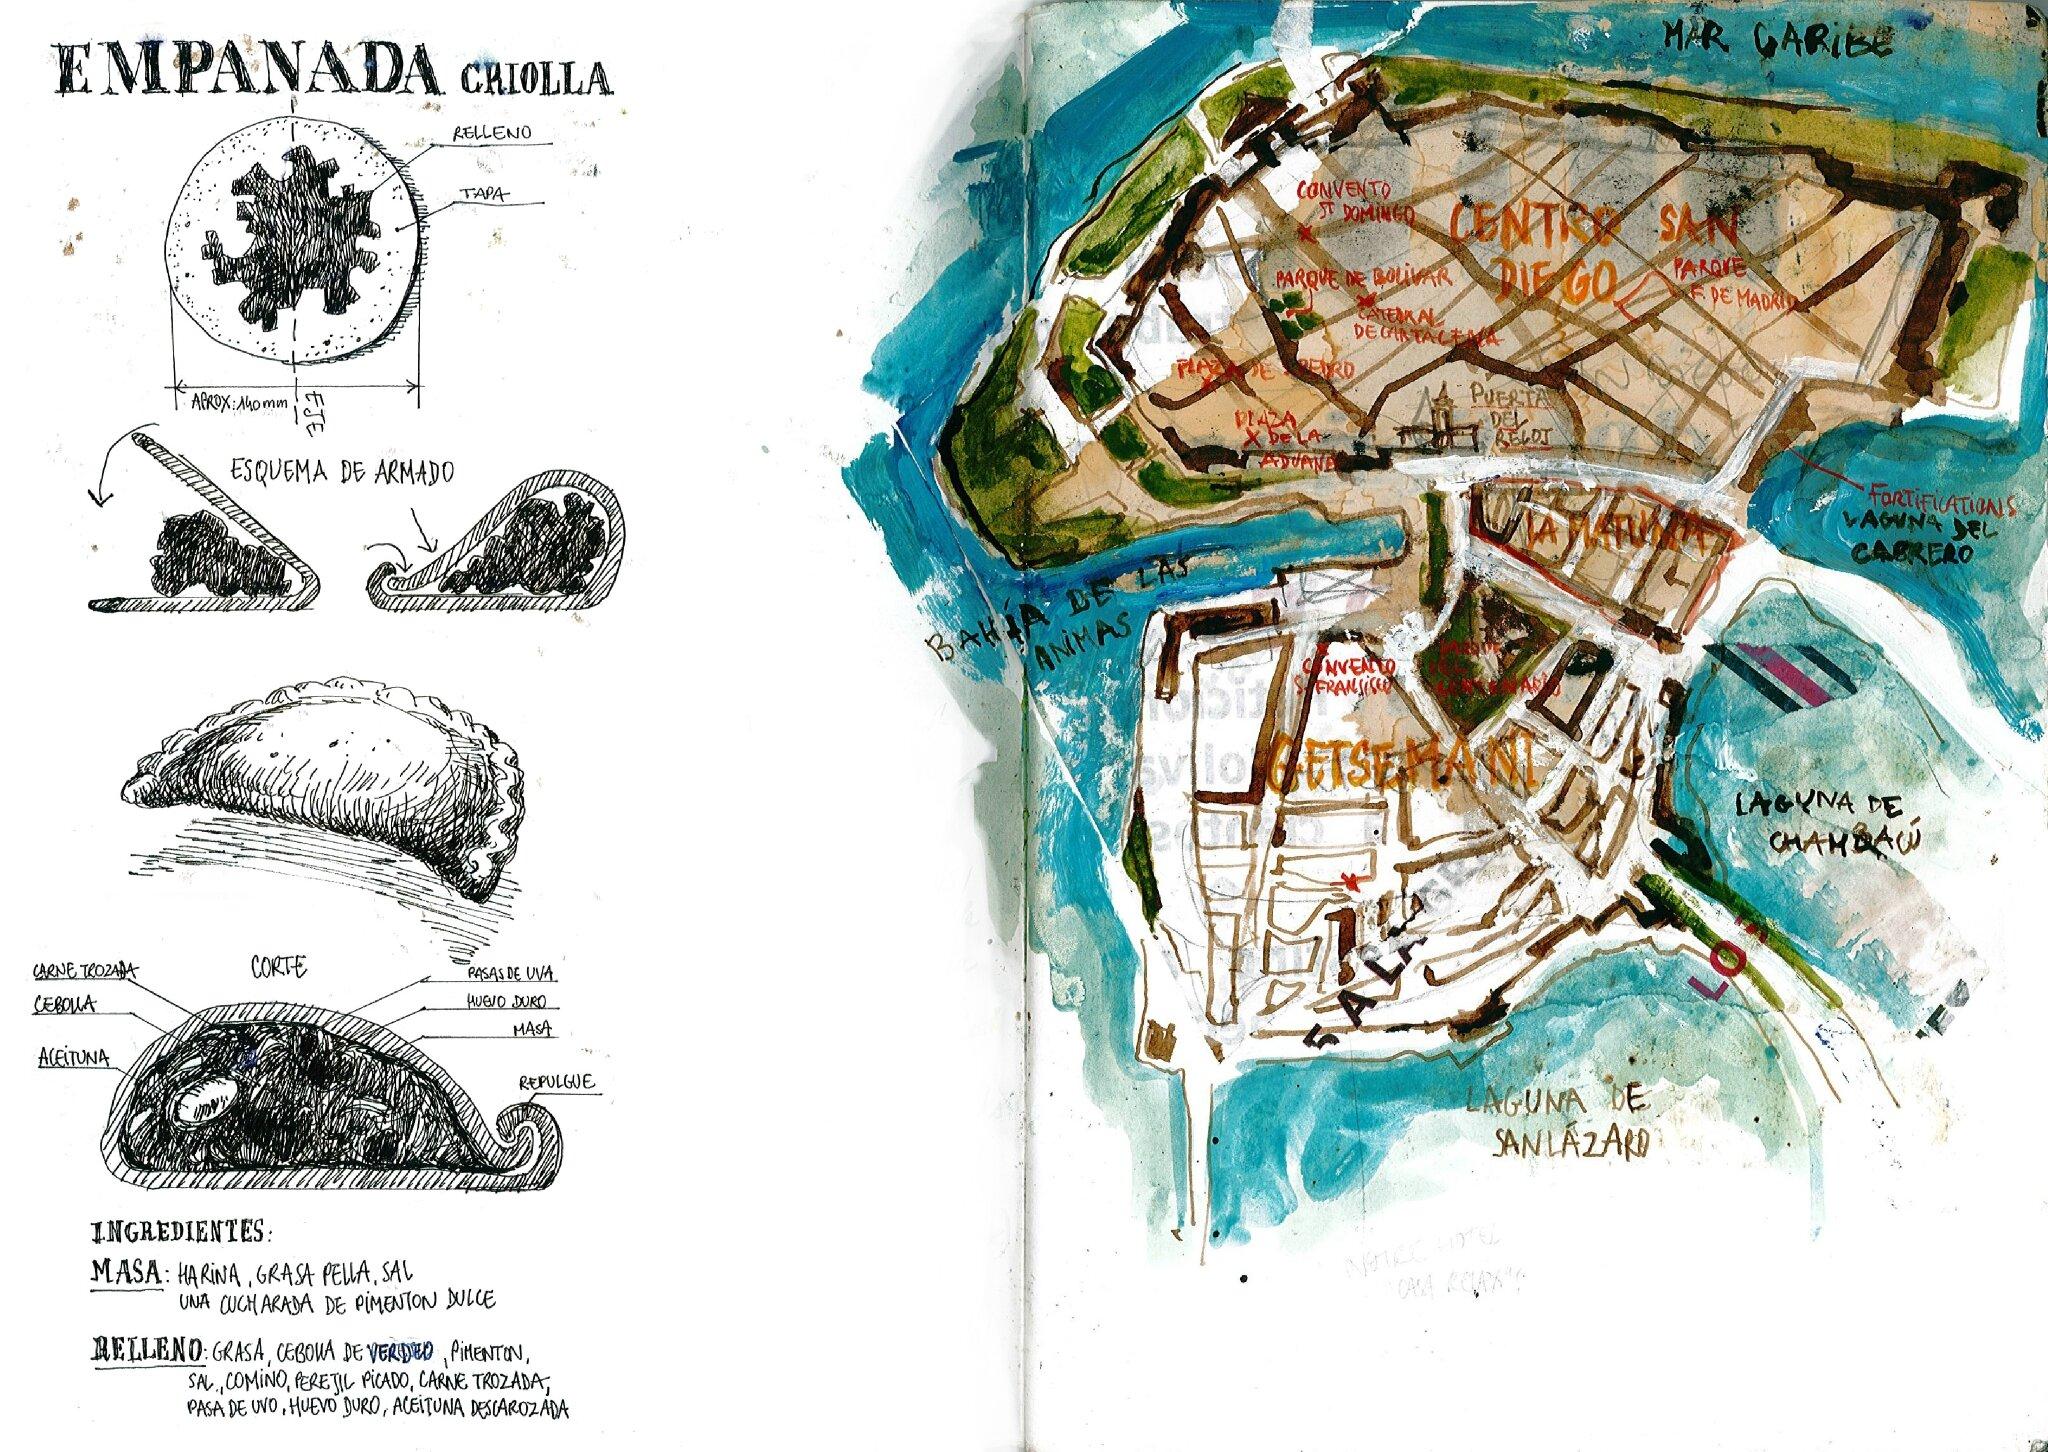 9 Cartagena de Indias